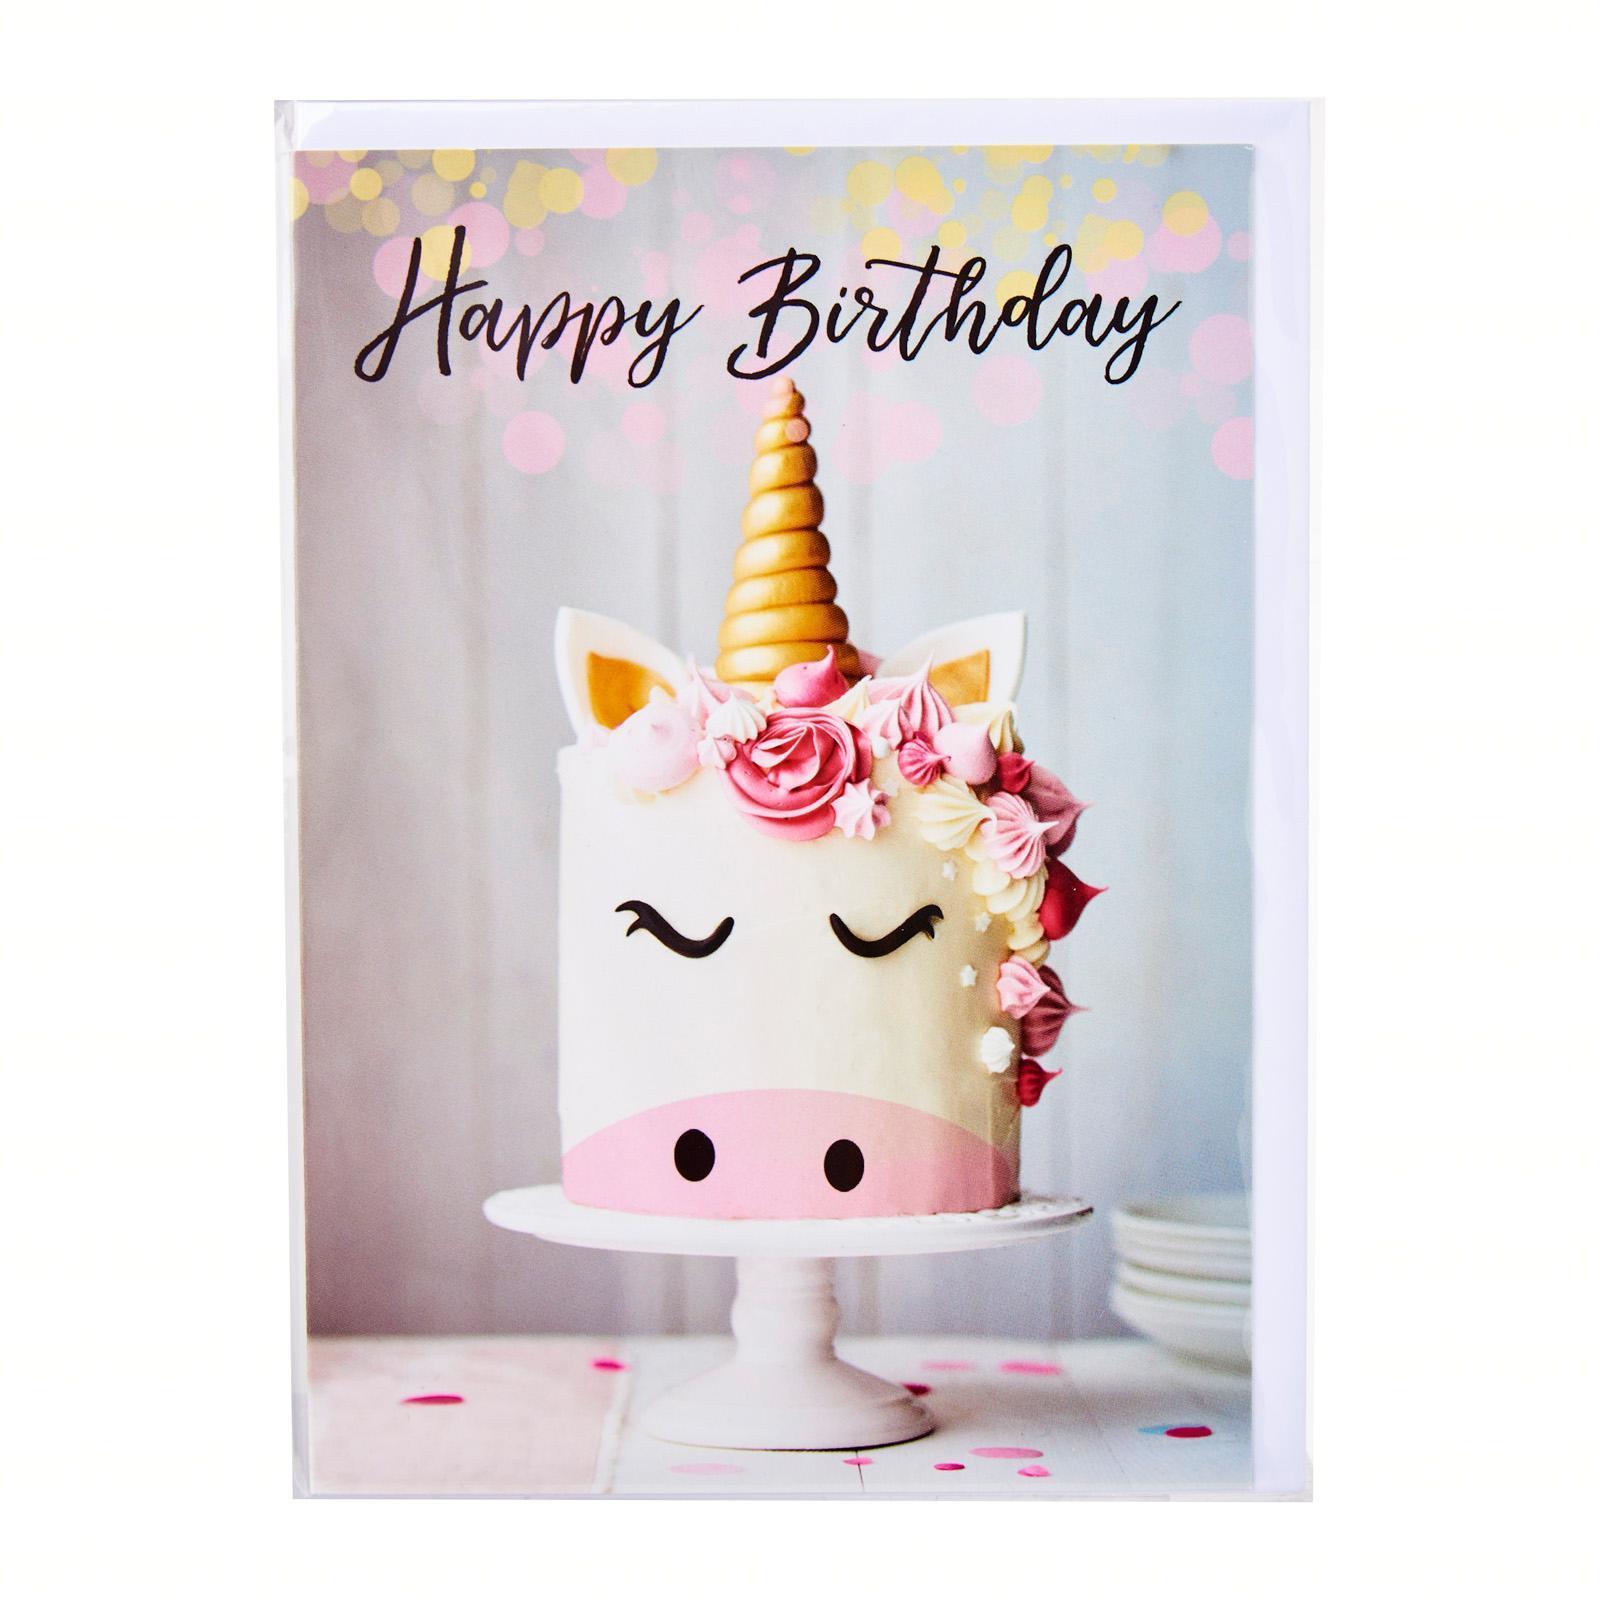 Affordable Cards Unicorn Cake - Happy Birthday